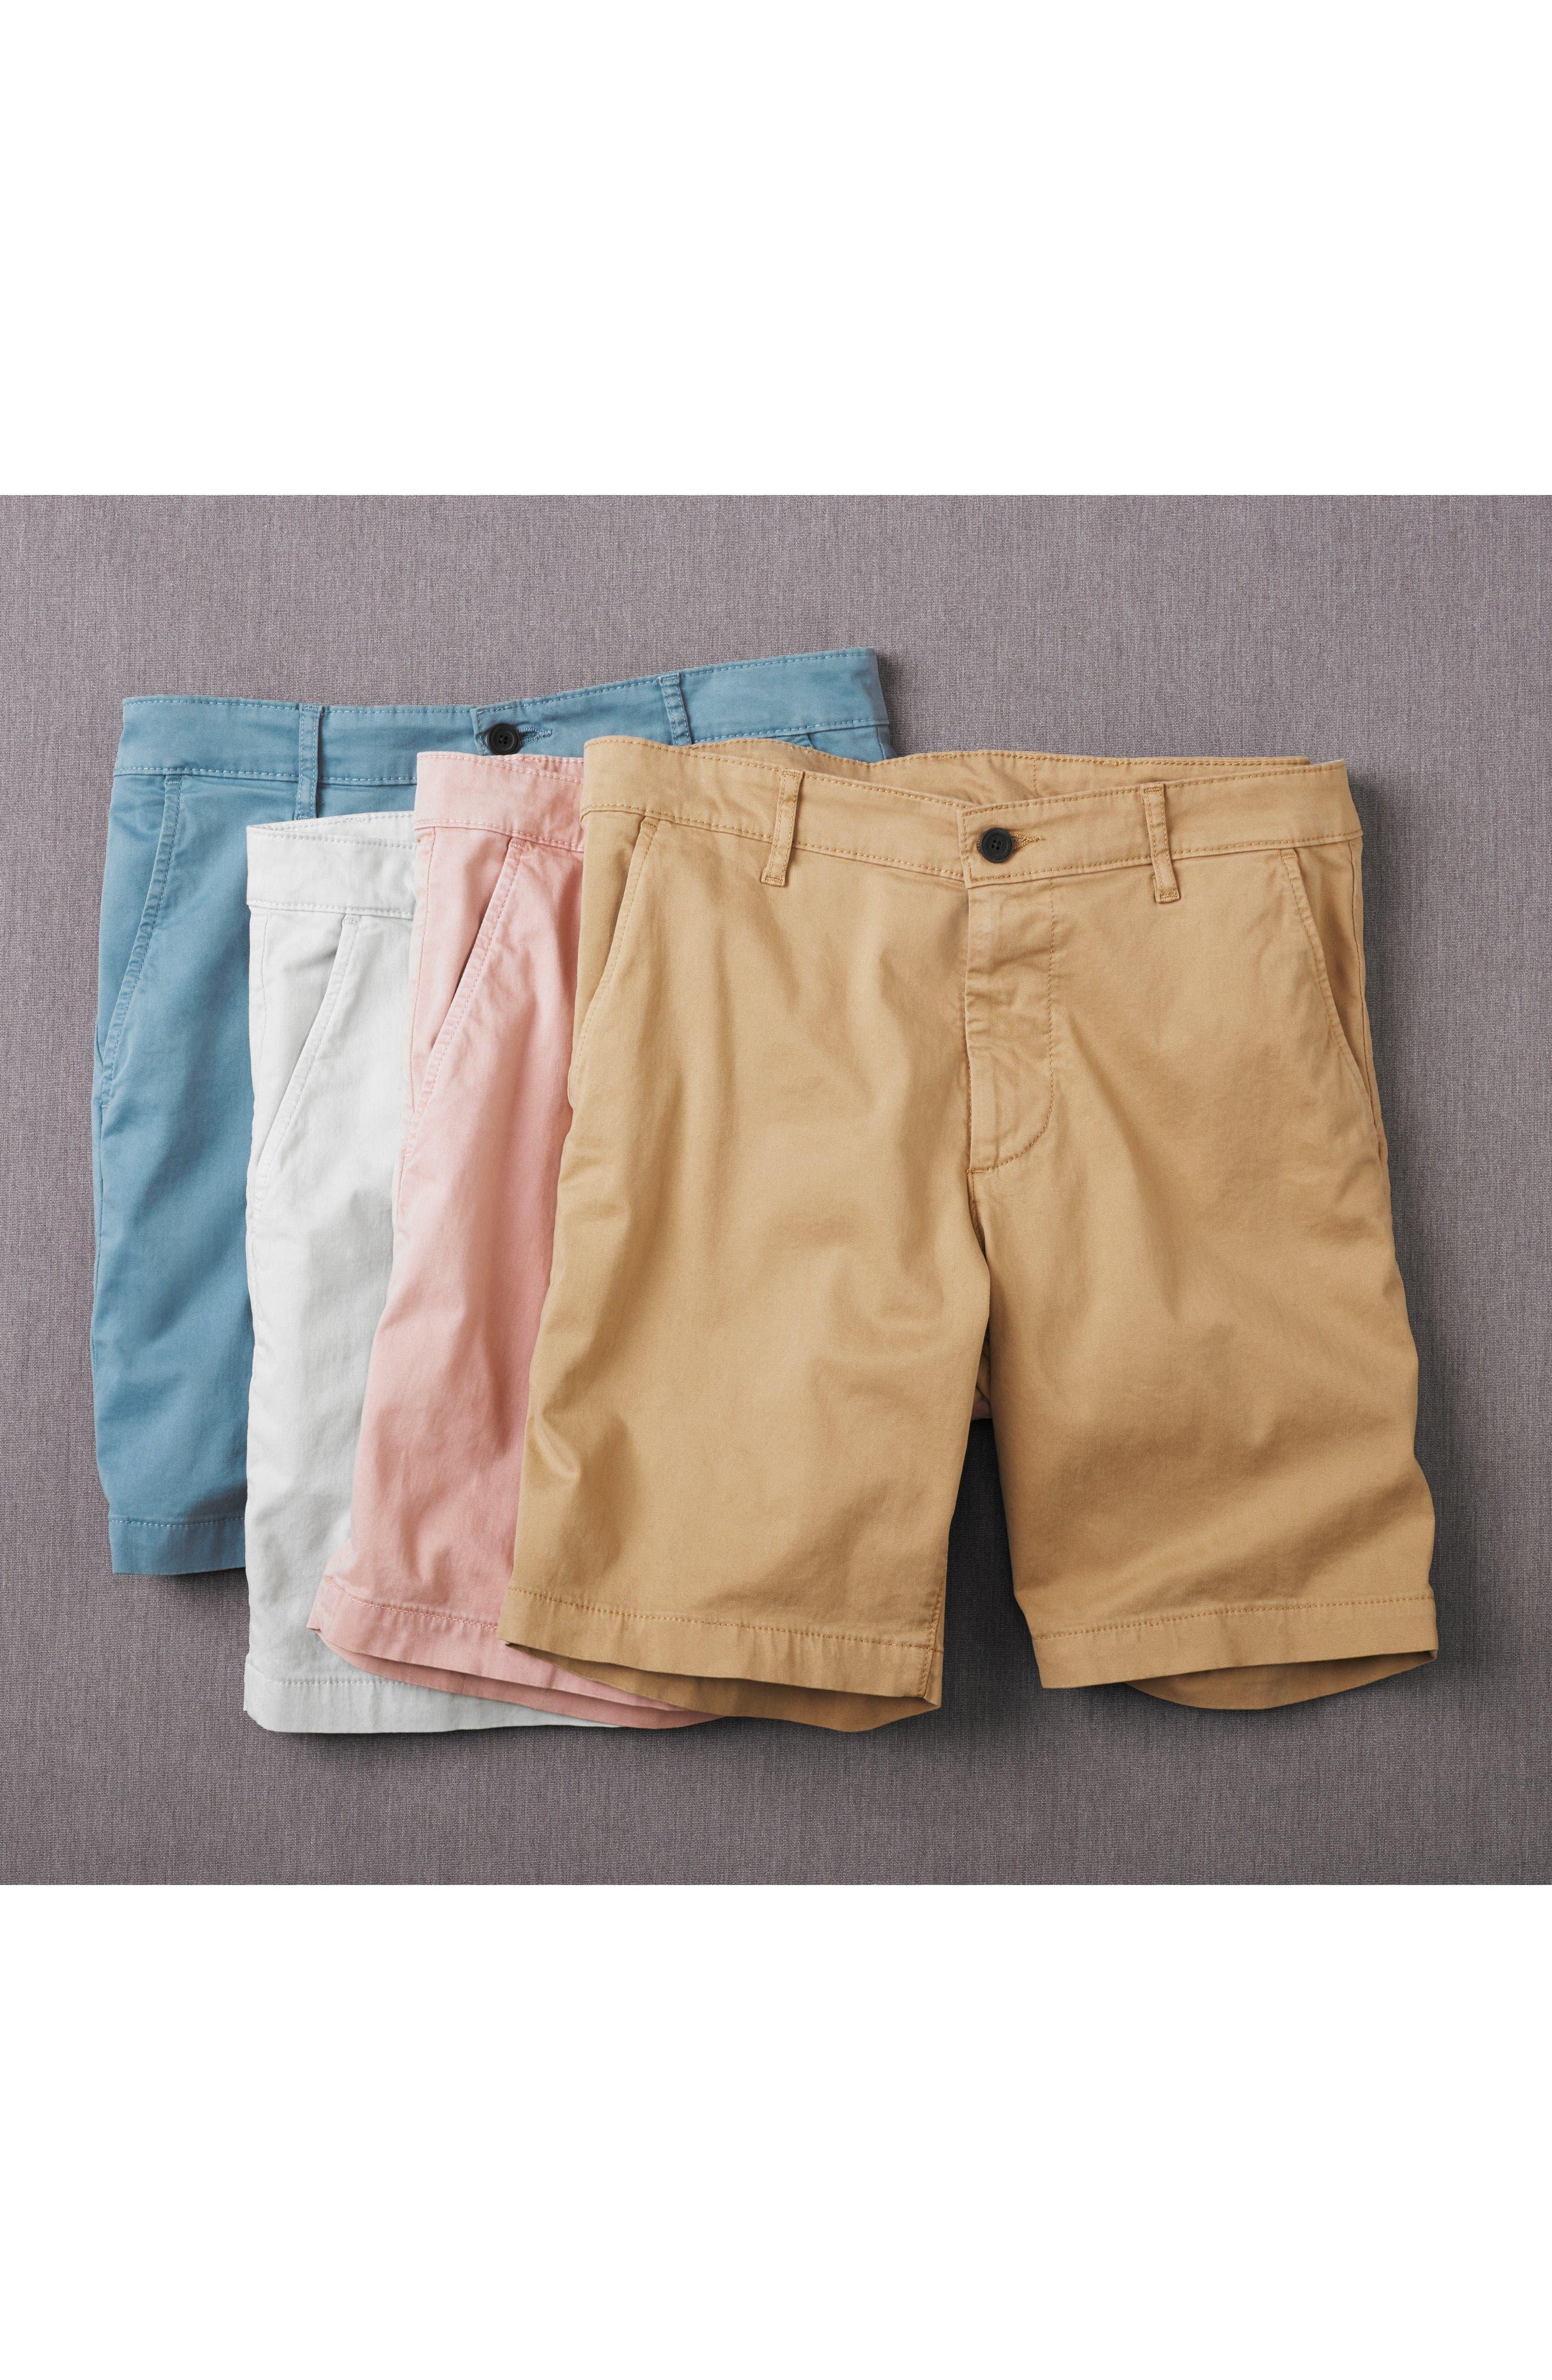 Wanderer Modern Slim Fit Shorts,                             Alternate thumbnail 8, color,                             MORNING MIST